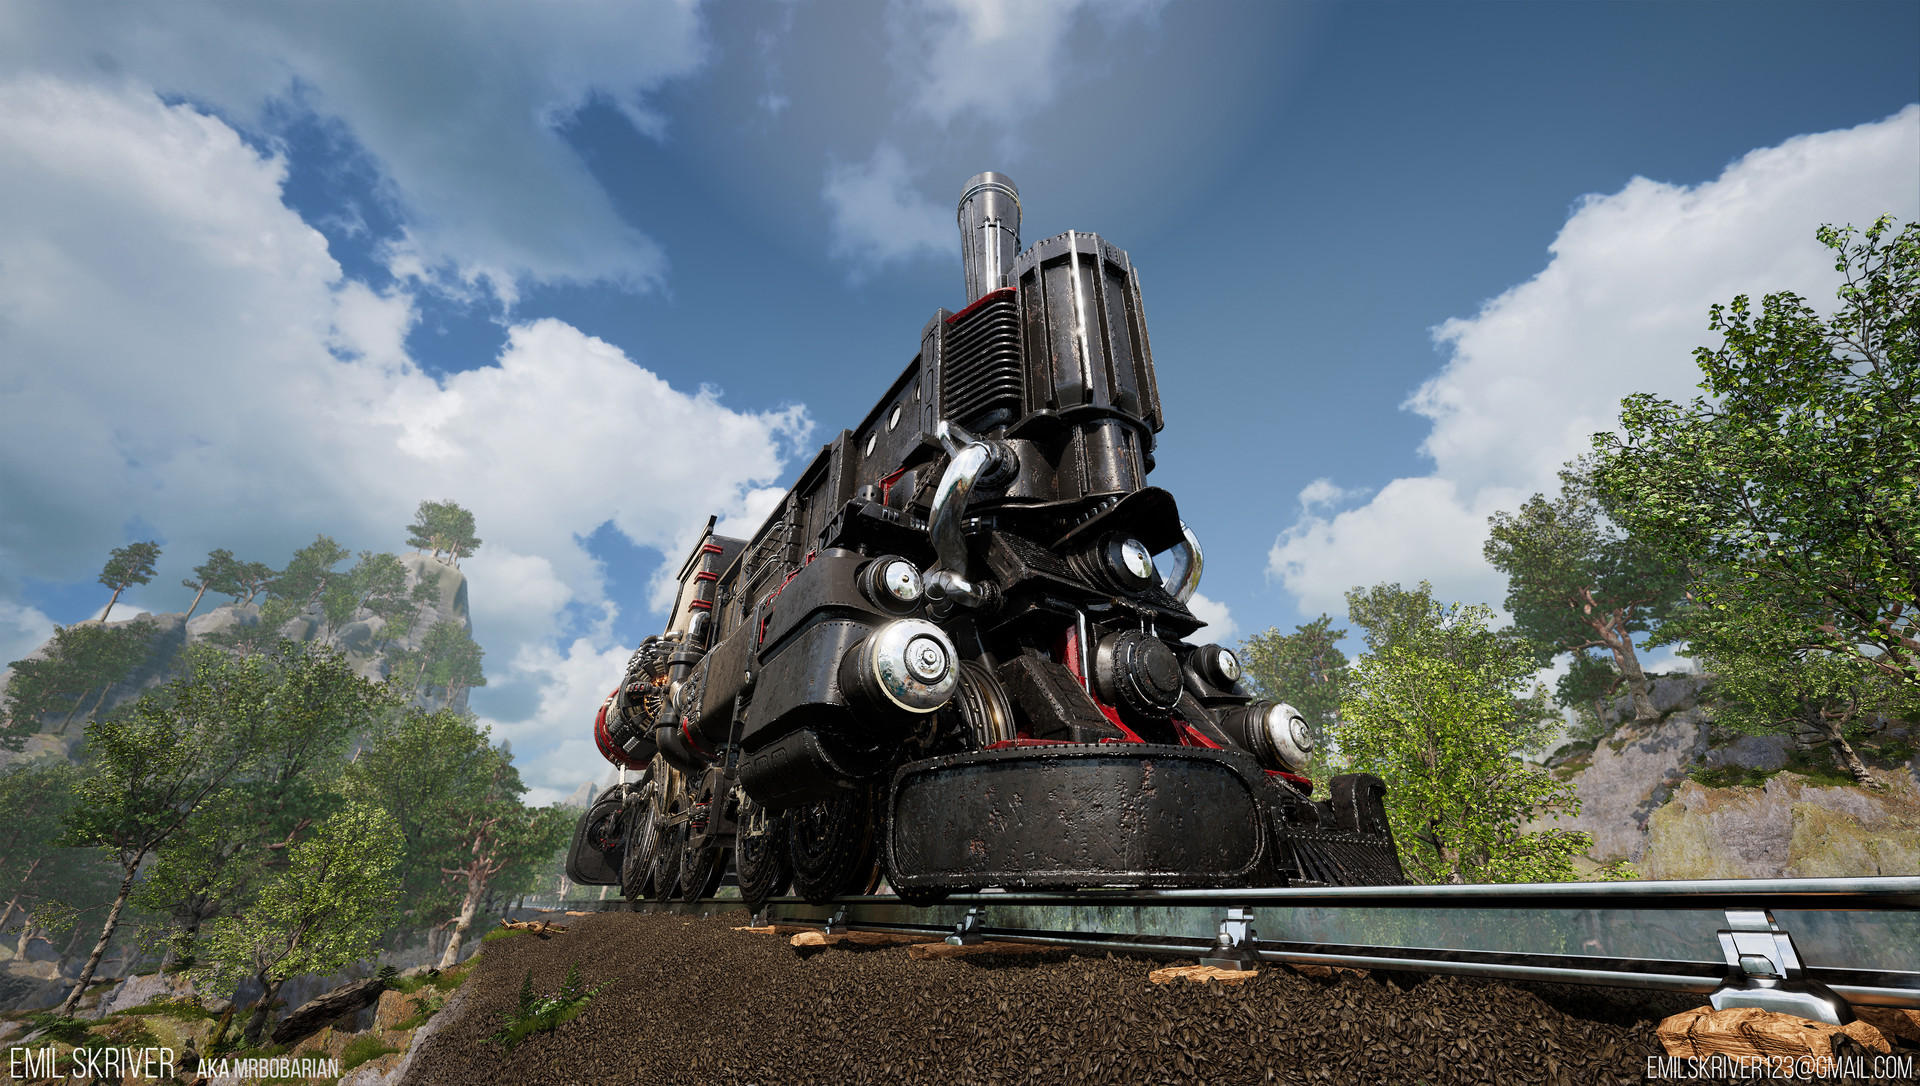 Emil skriver train frontright